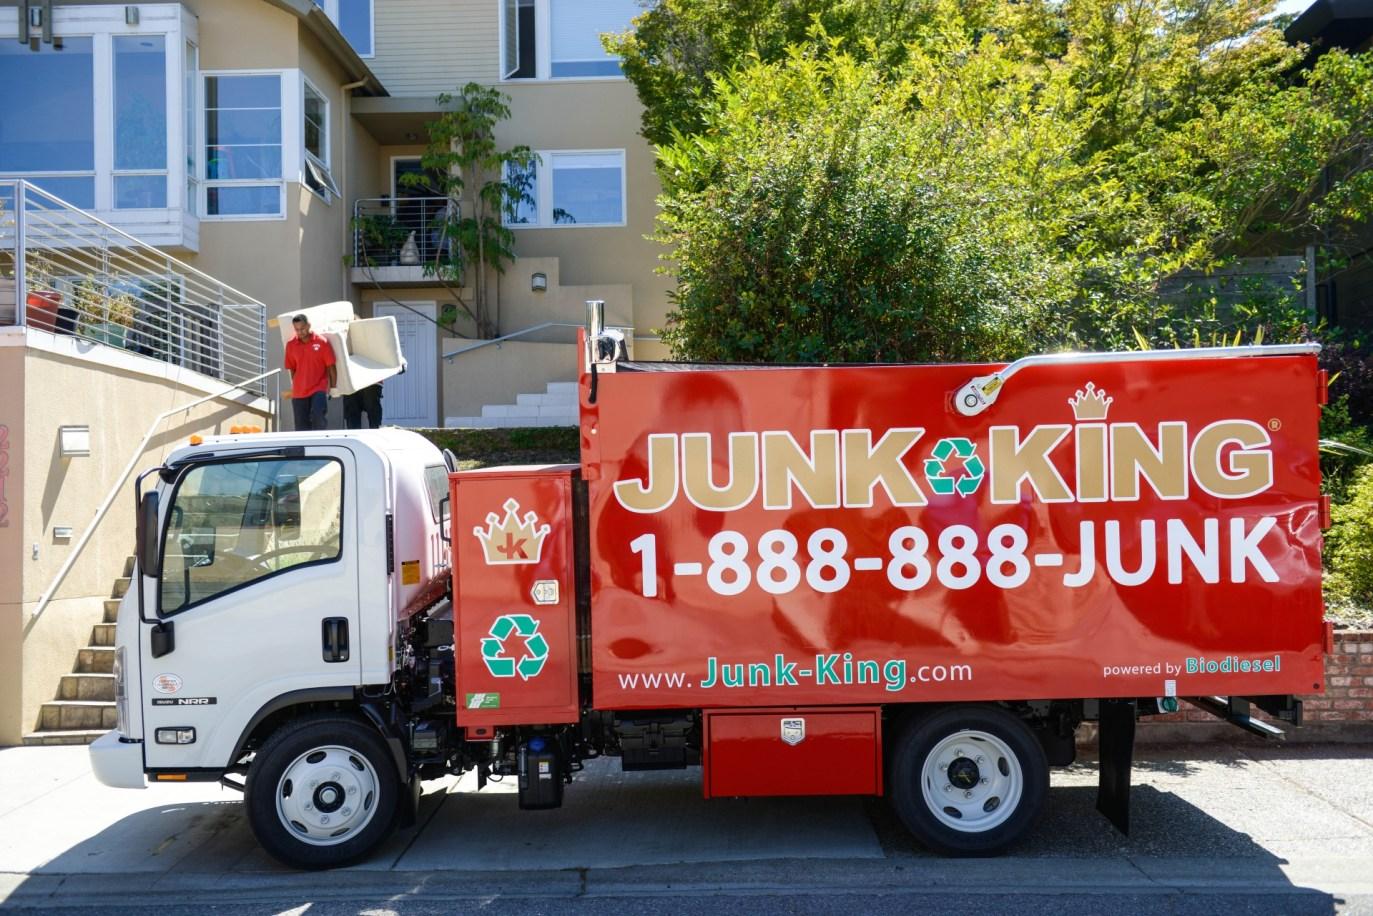 junk-king-best-franchises-2020-2